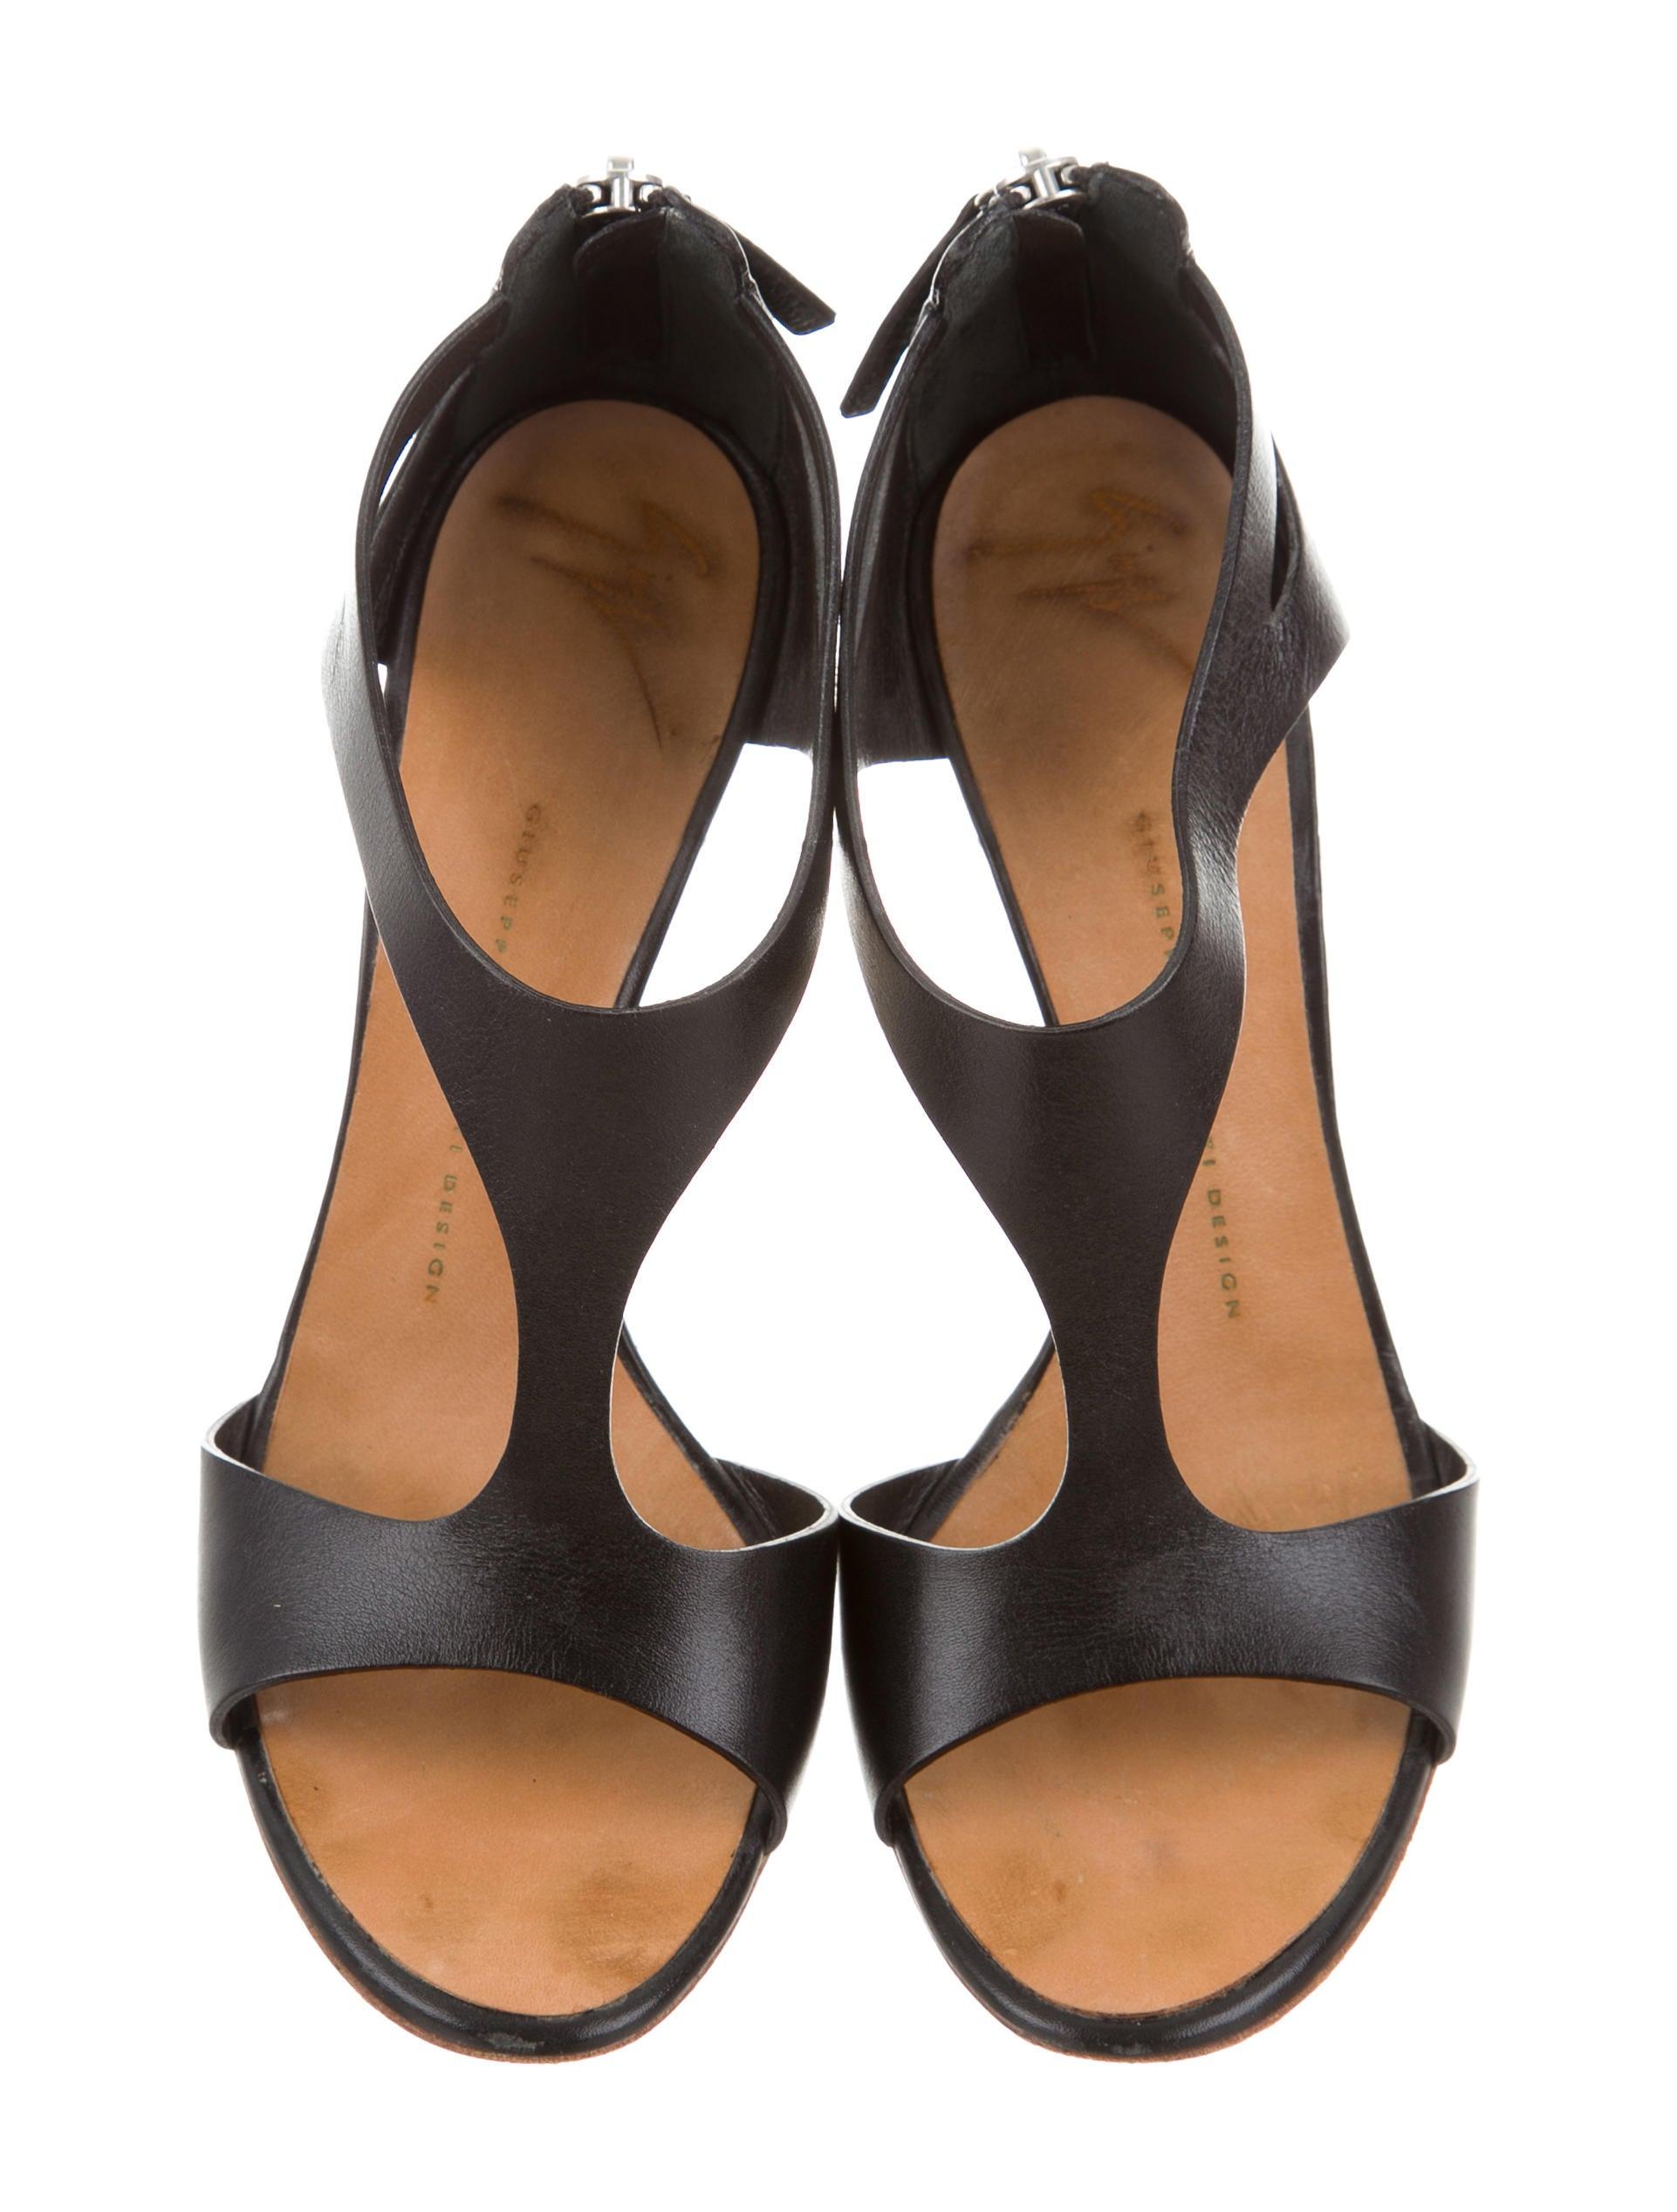 Giuseppe Zanotti Cutout Leather Sandals - Shoes